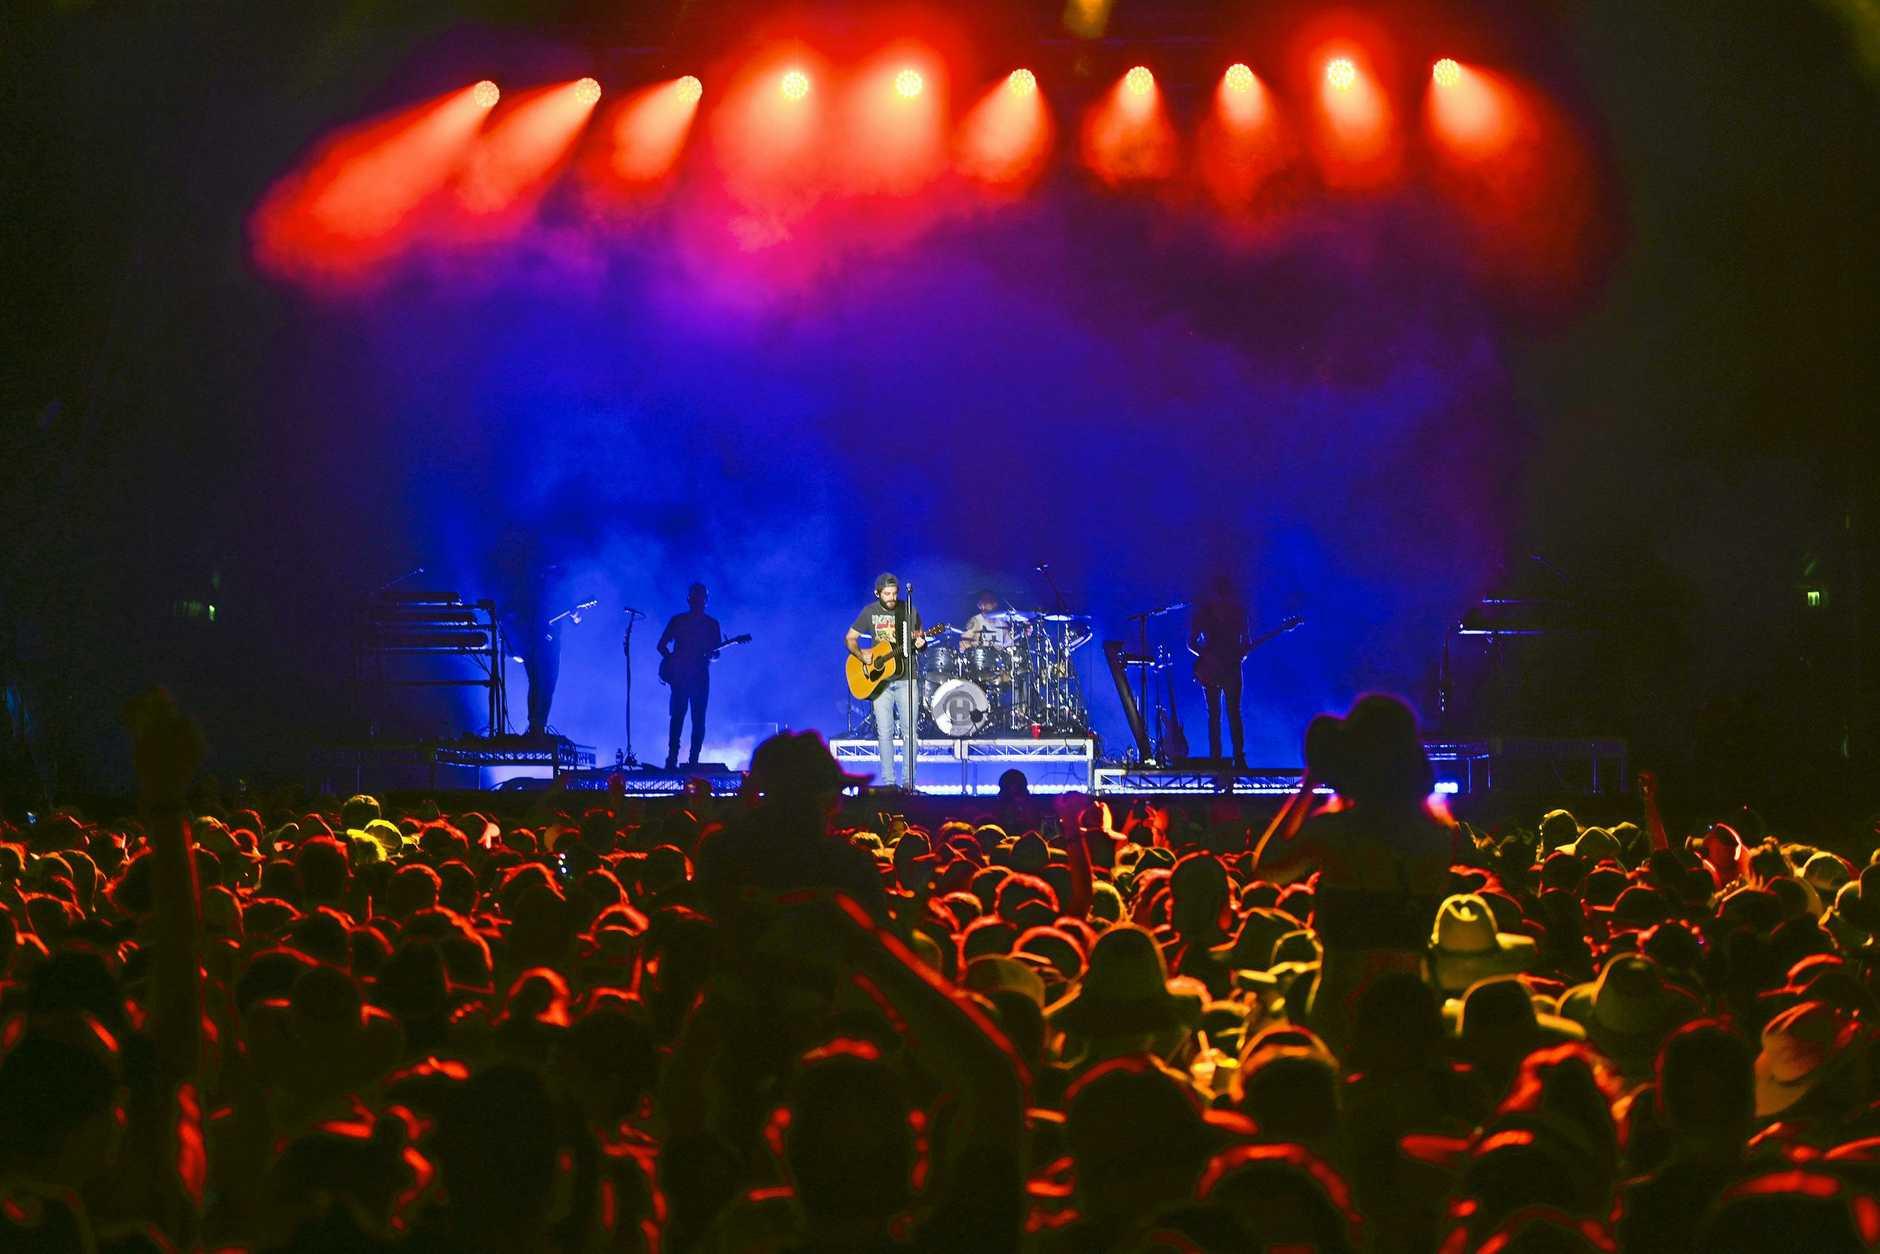 Thomas Rhett on stage at CMC Rocks.